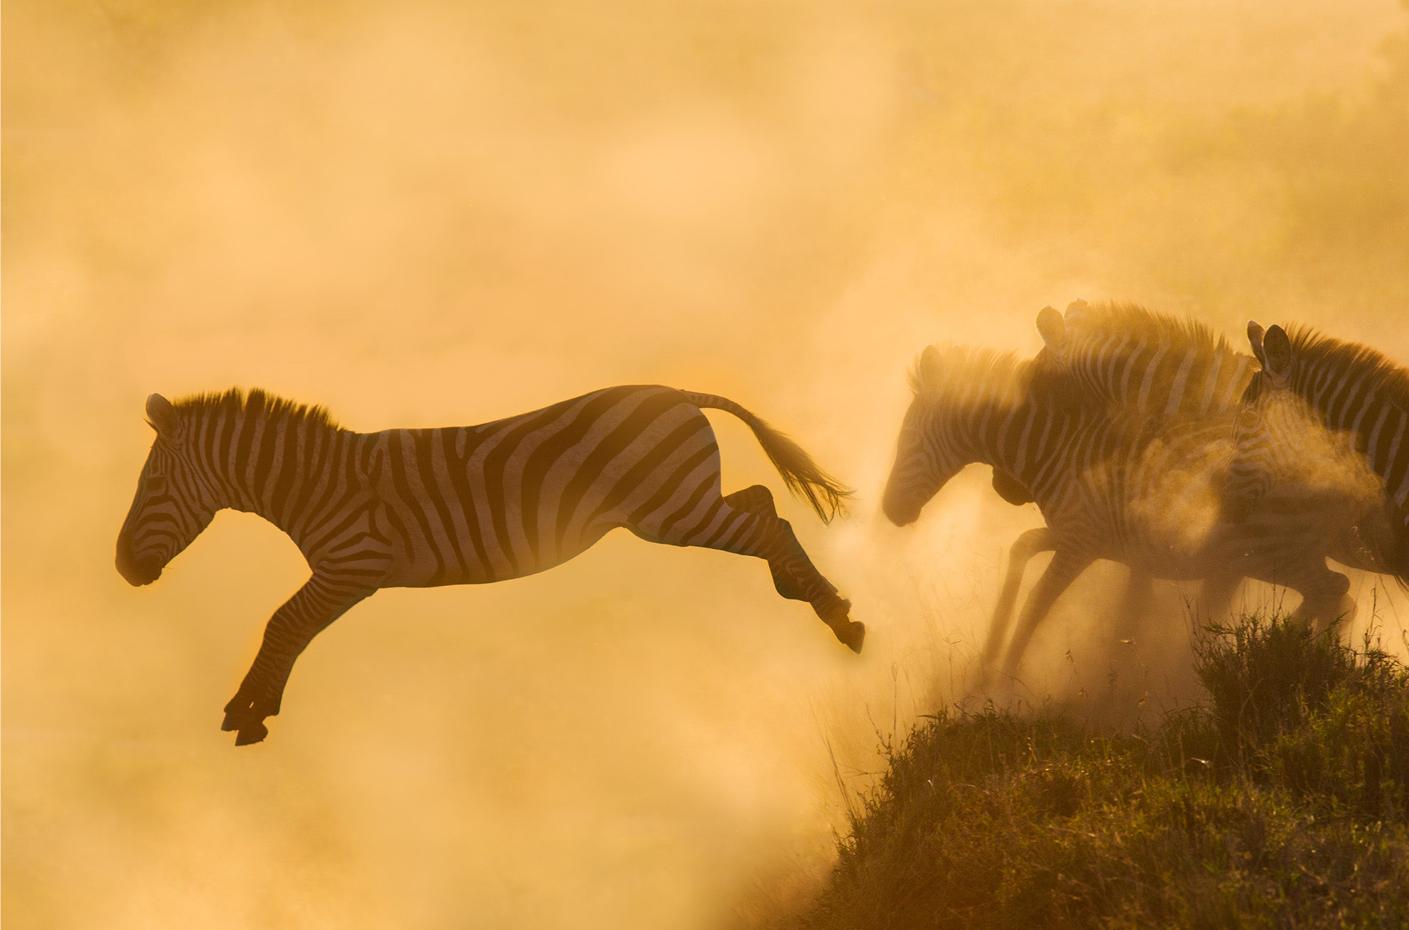 richard bernabe, zebra, landscape photography, africa, zebra, zebra herd, spirit of africa, desert, namibia, morocco